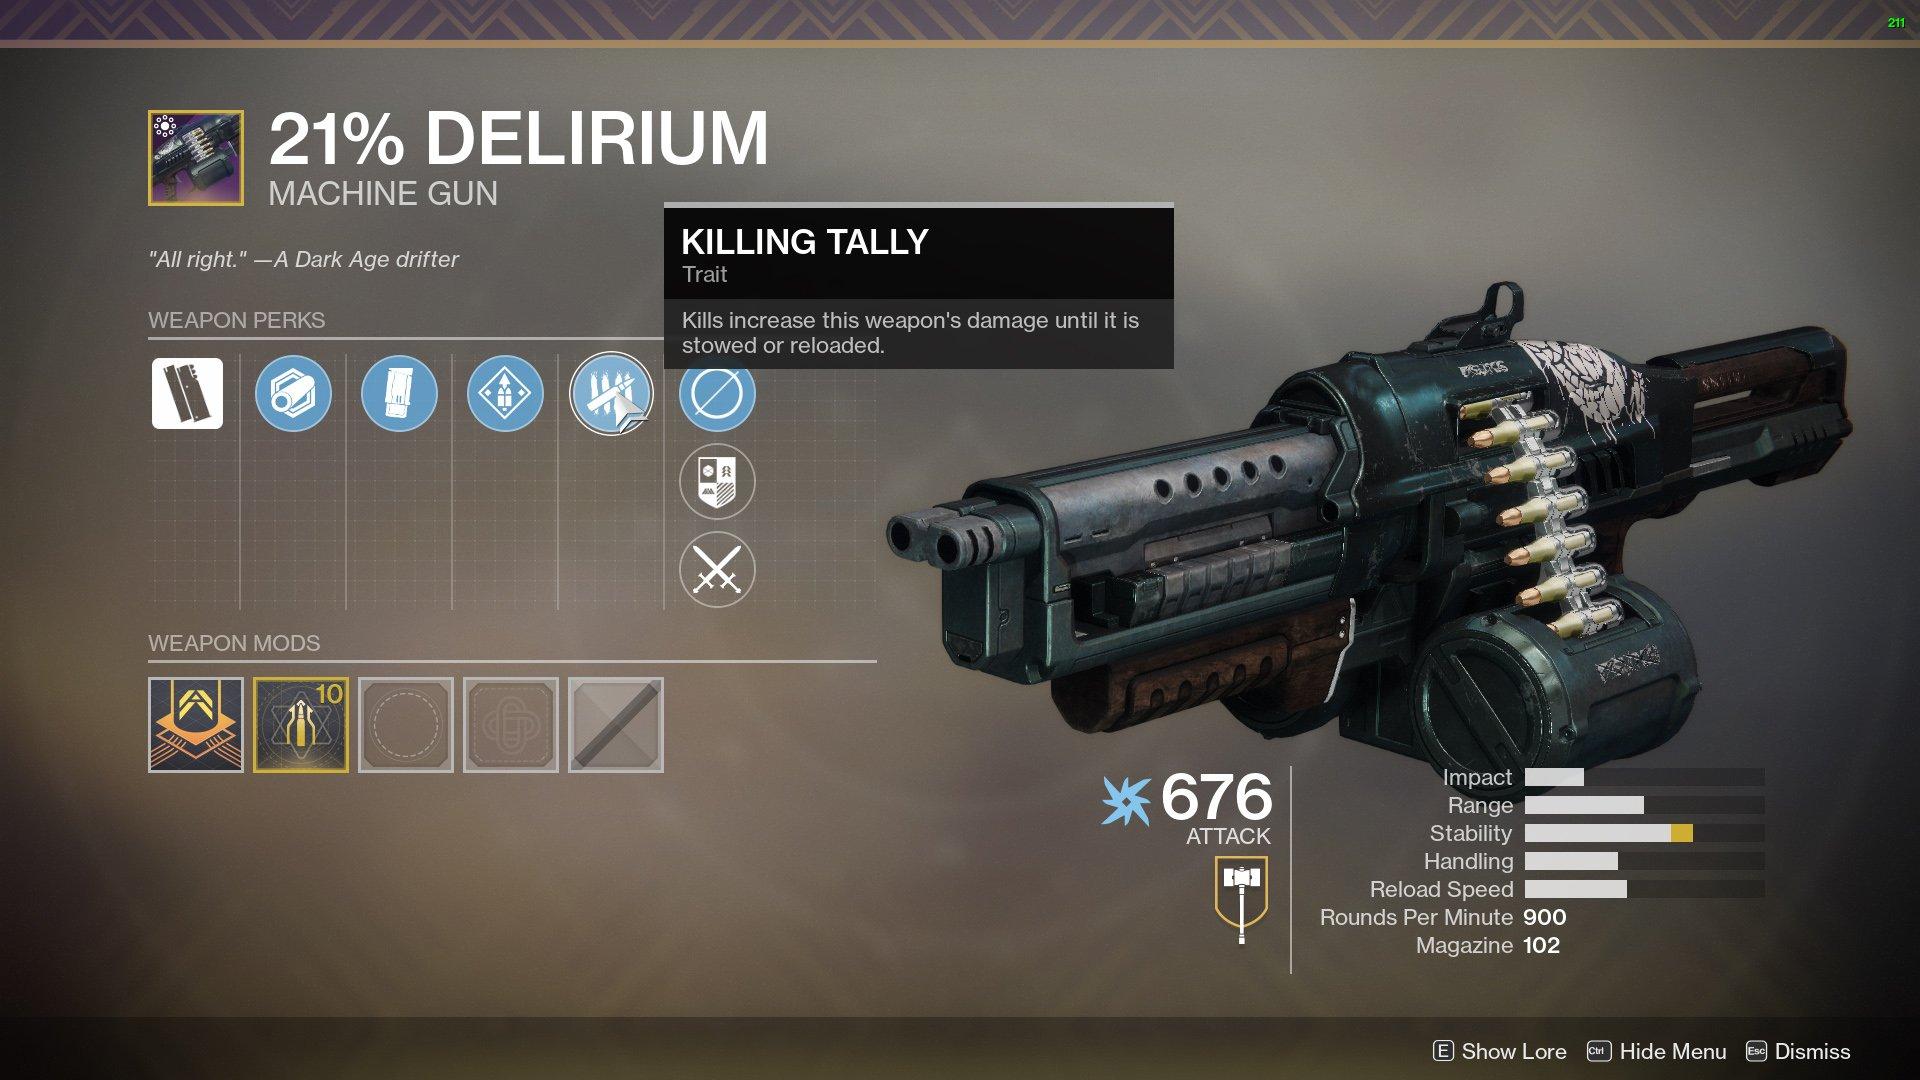 21% Delirium Destiny 2